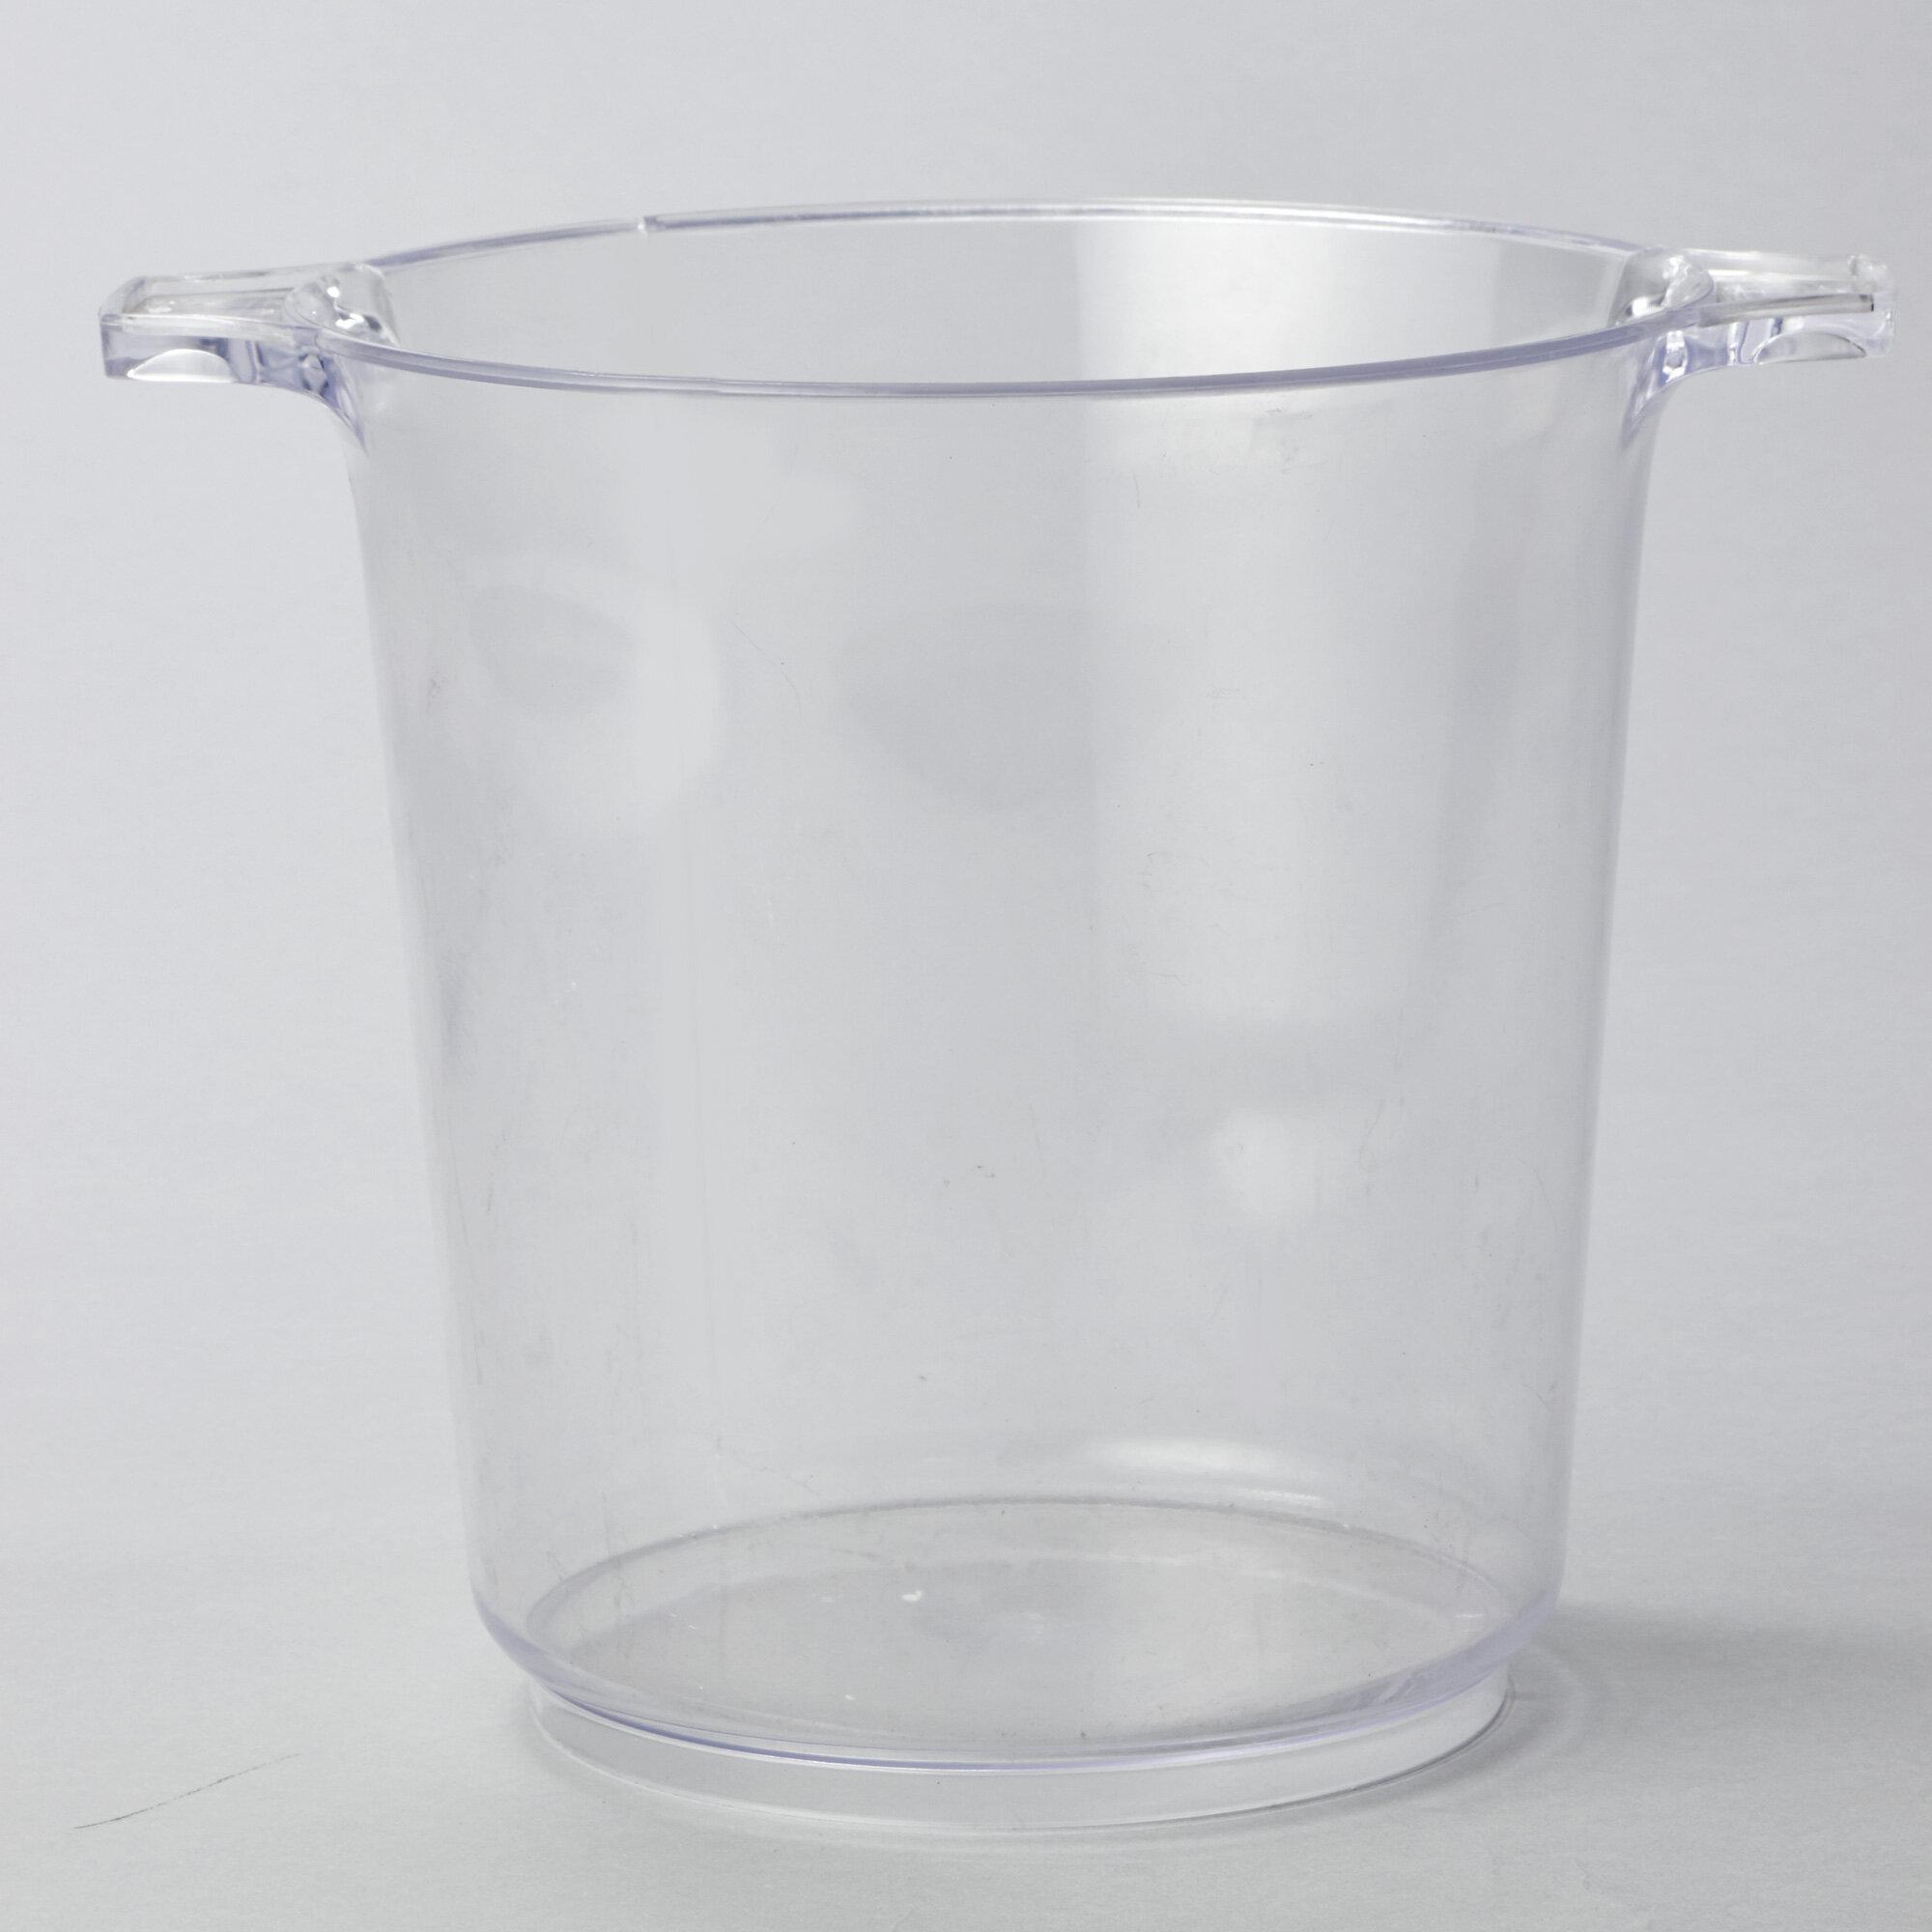 Rebrilliant Hong 1 Gallon Plastic Ice Bucket Set Of 12 Wayfair